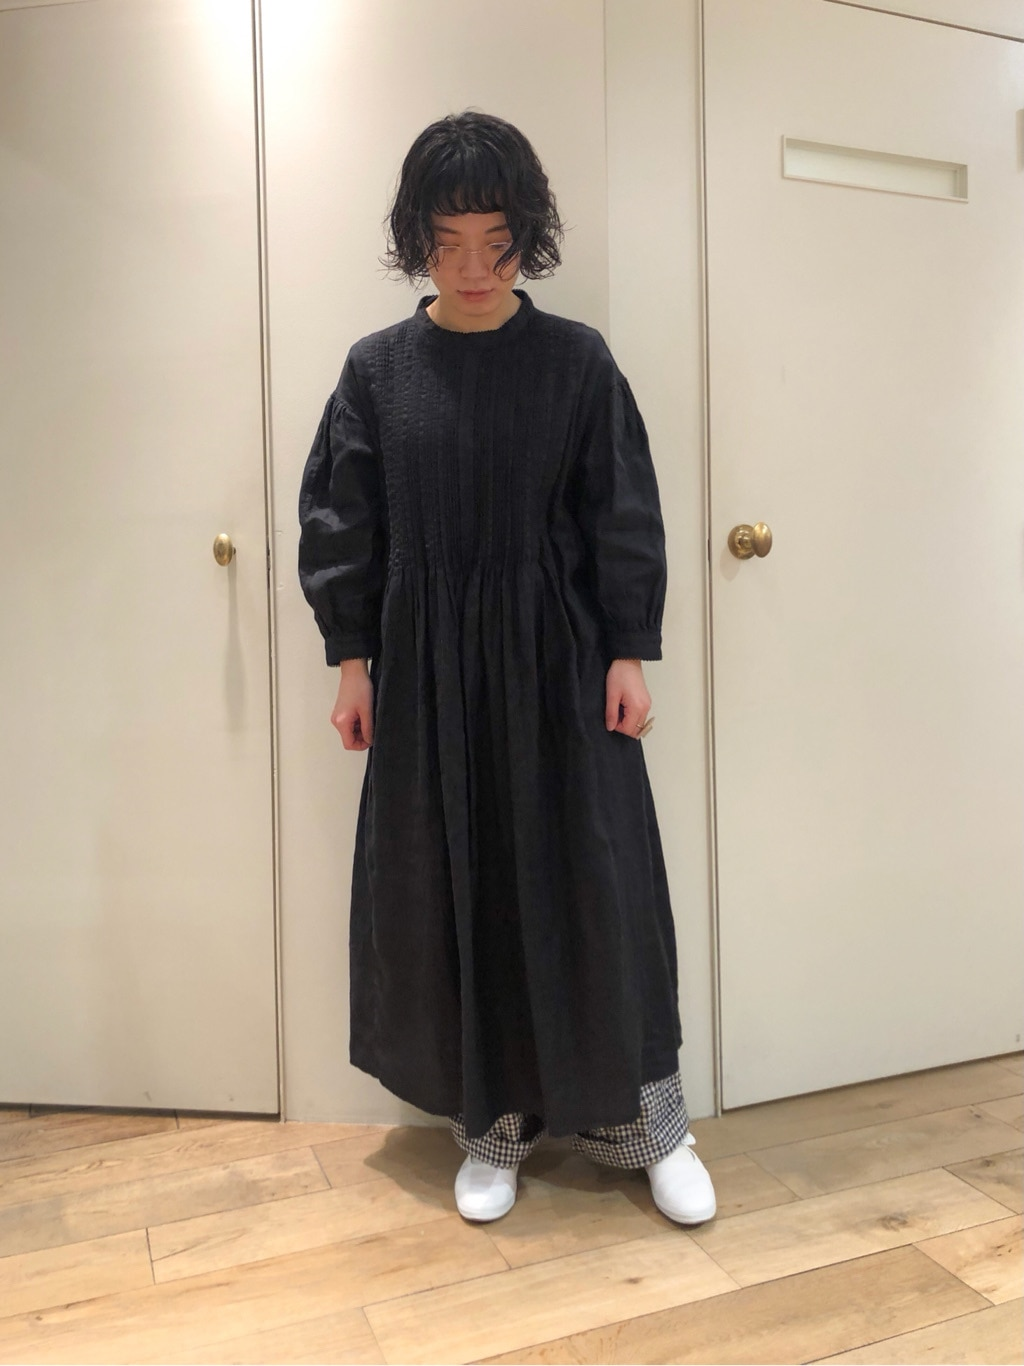 bulle de savon 新宿ミロード 身長:156cm 2021.02.16